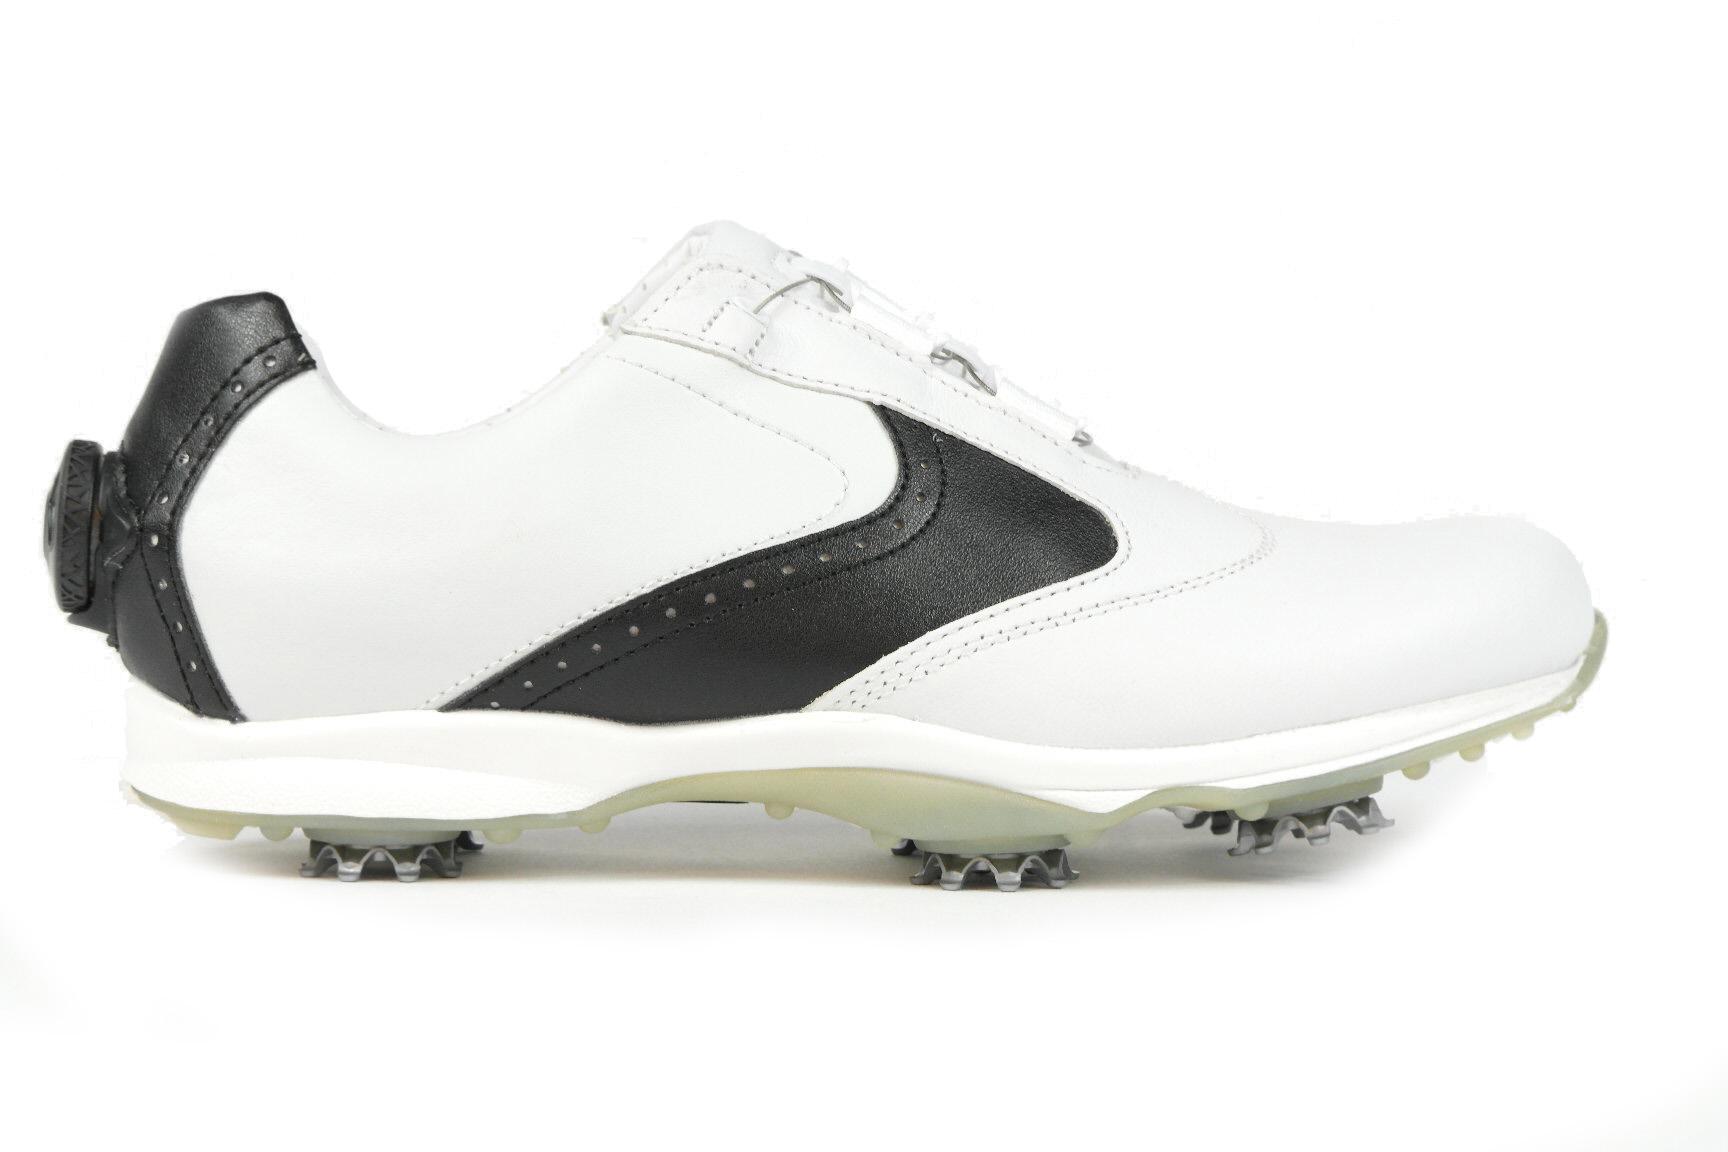 brand new 23304 b8eb3 Footjoy Embody +Boa Dames golf schoenen WIT ...